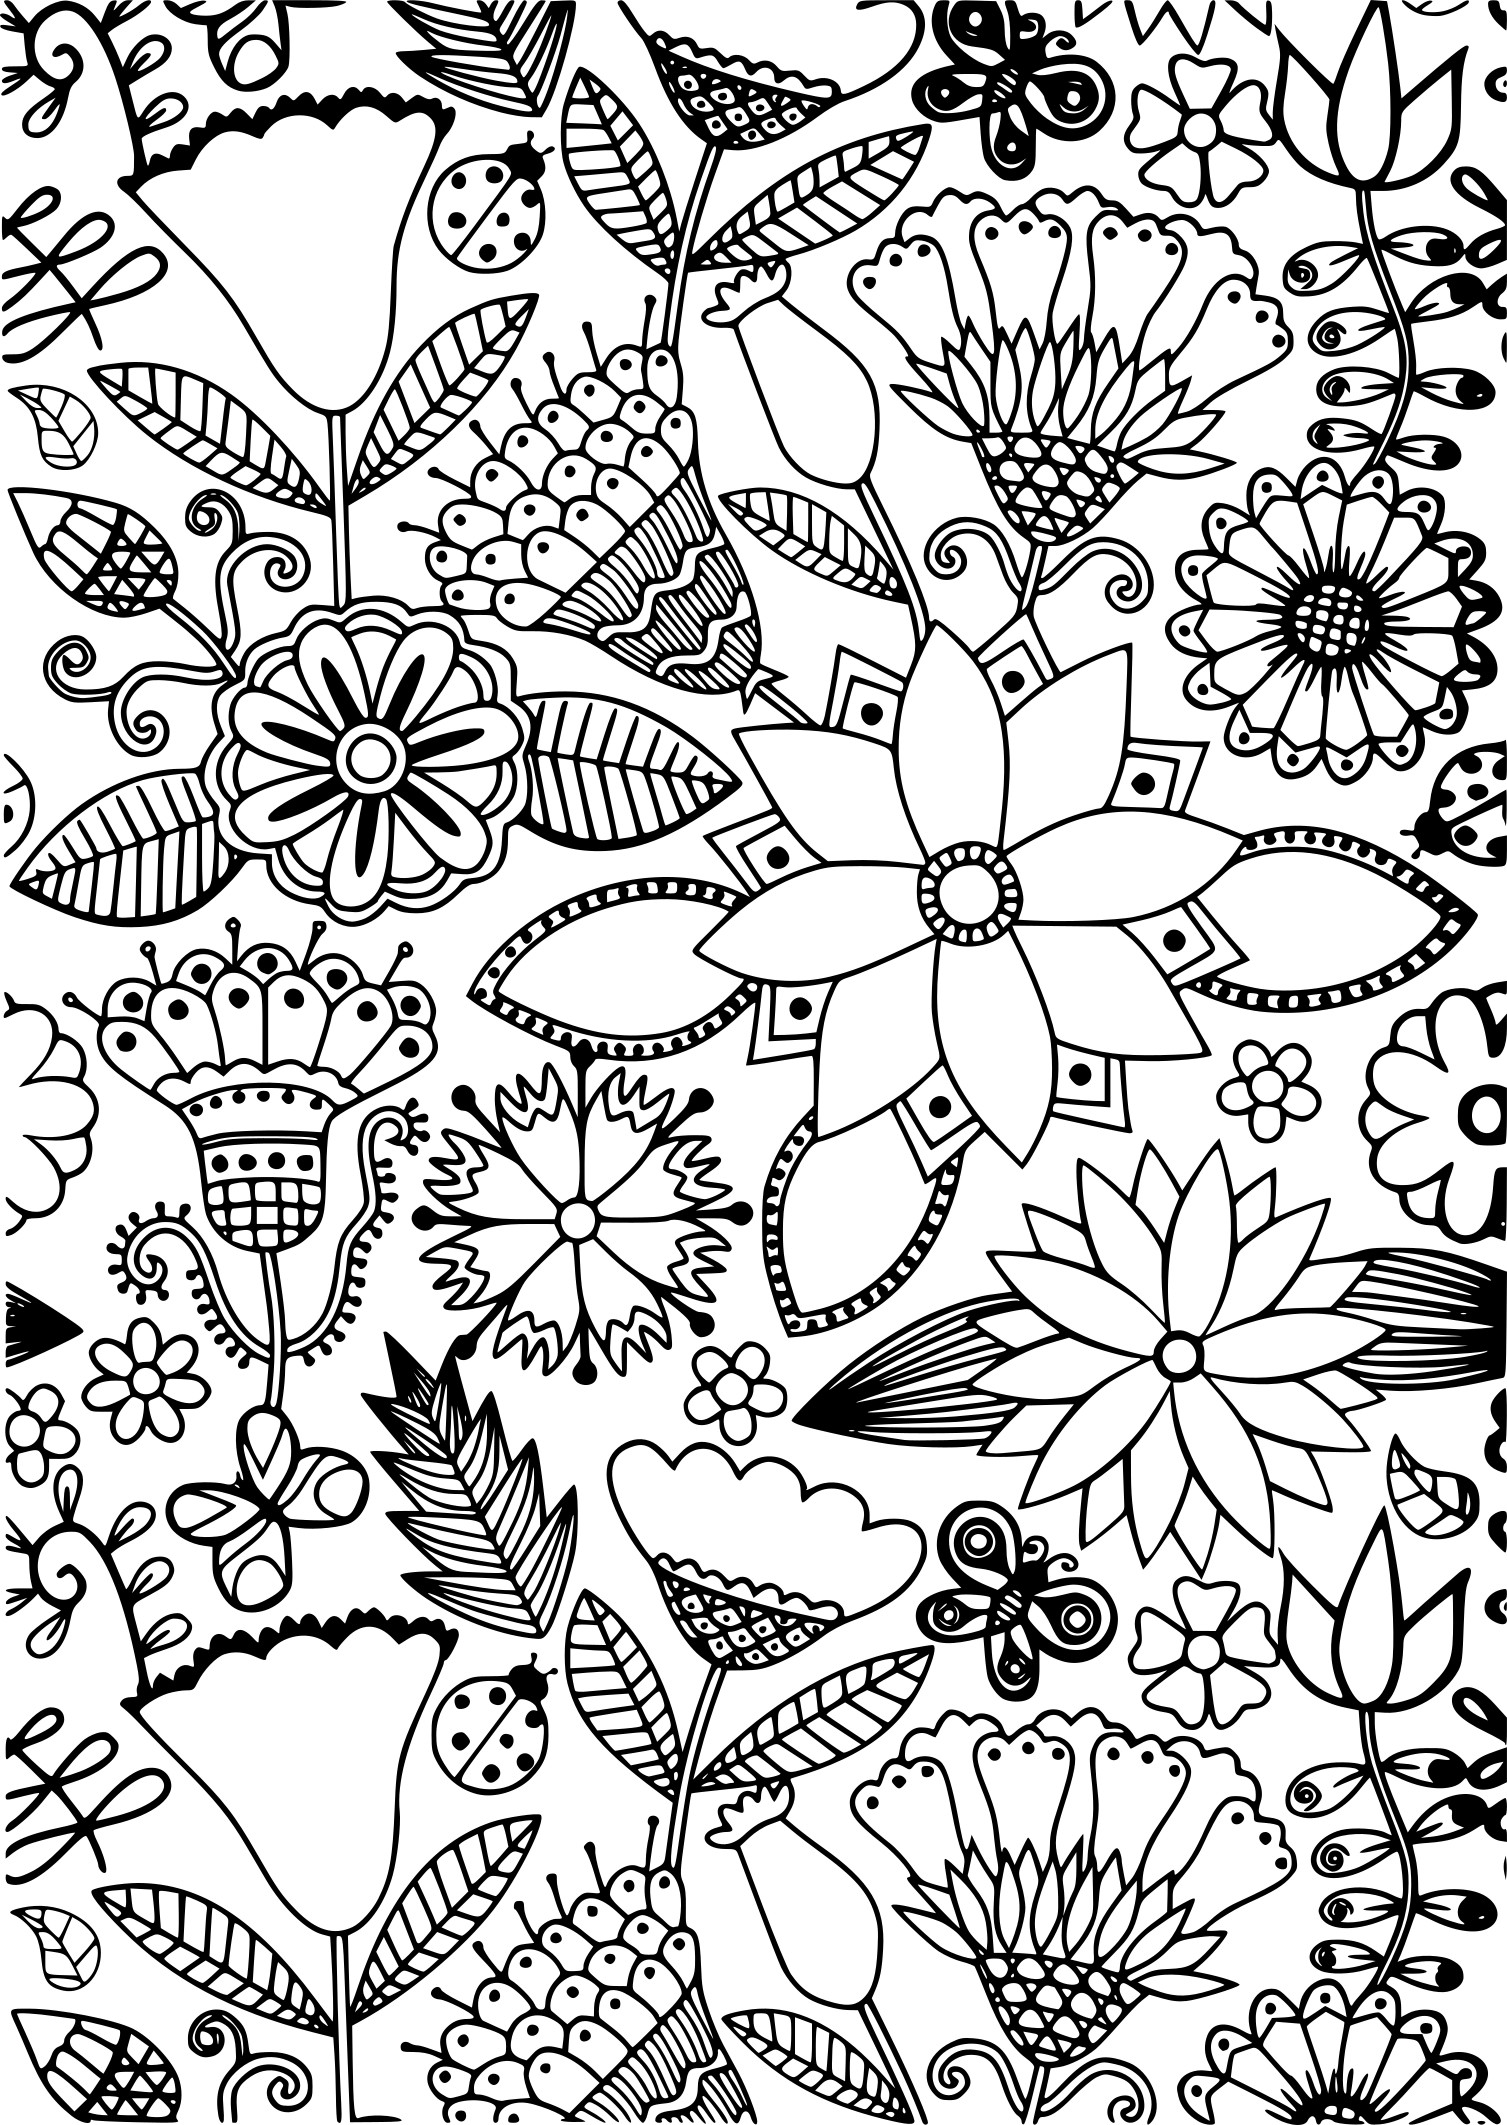 Coloriage Anti Stress Fleurs A Imprimer